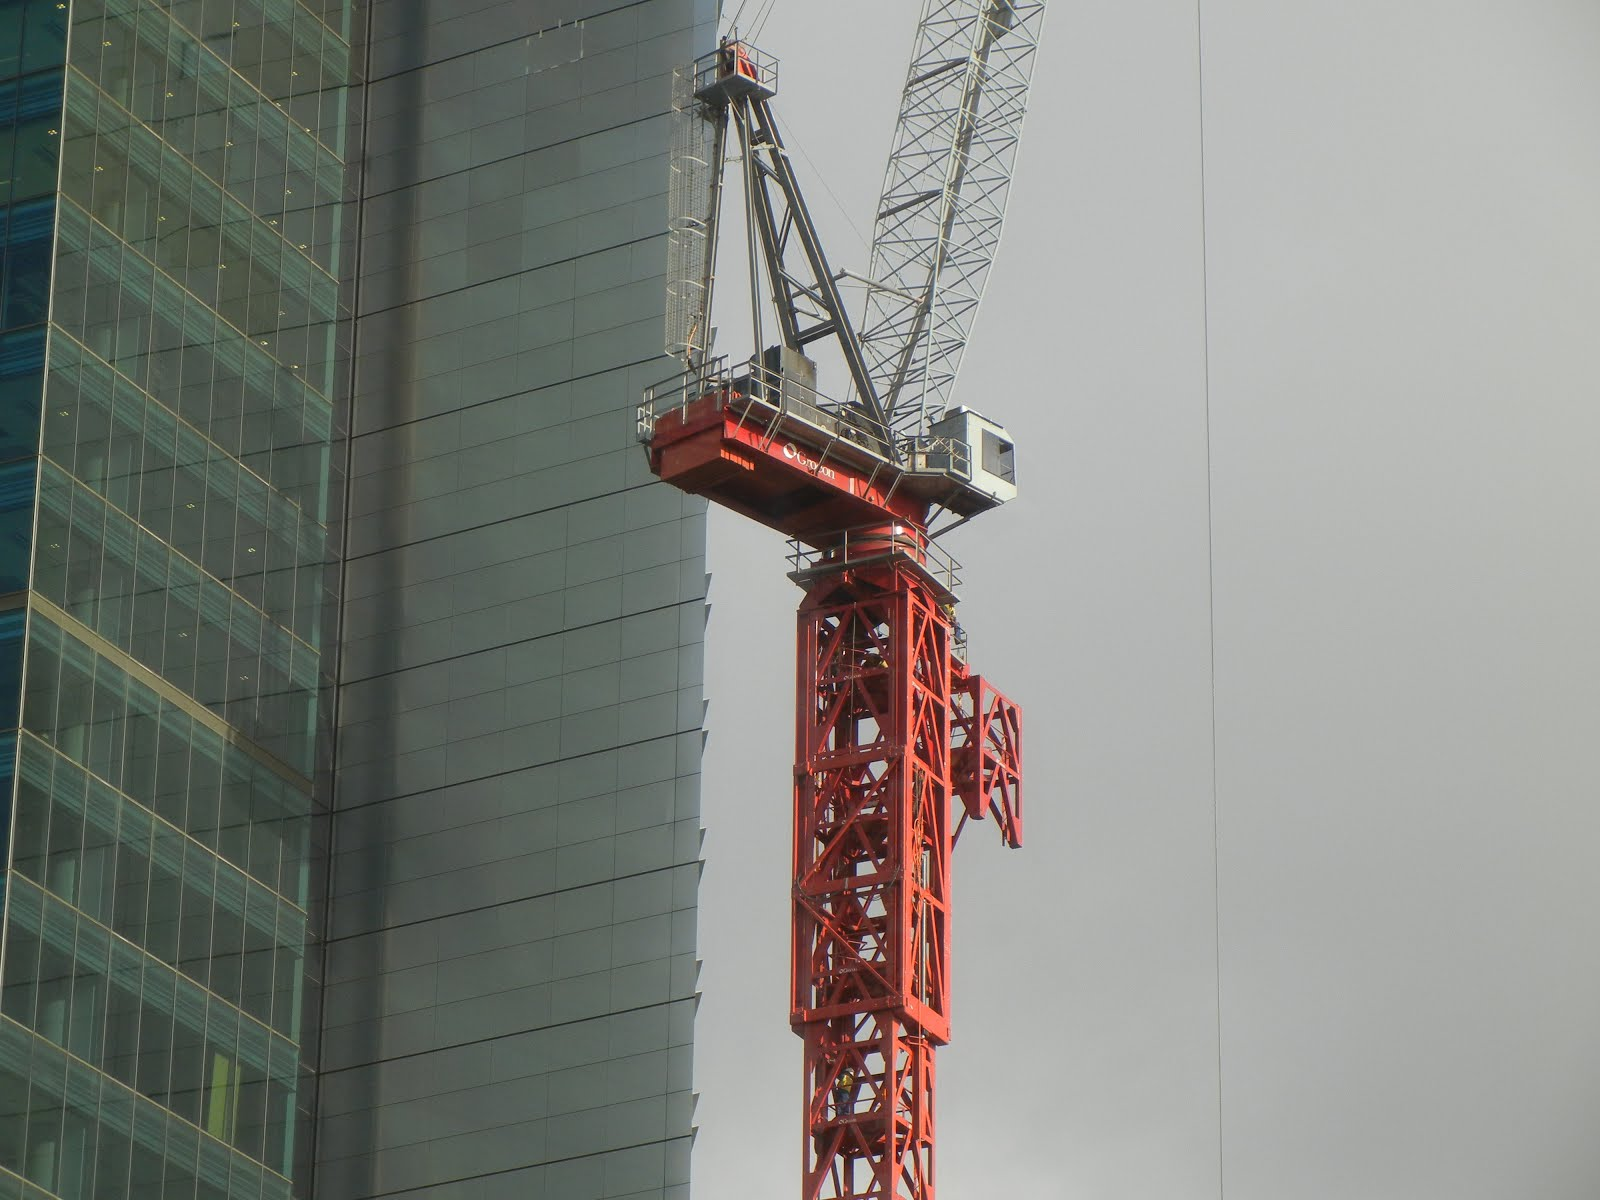 Tower Crane Climbing : Sydney australia self climbing tower crane